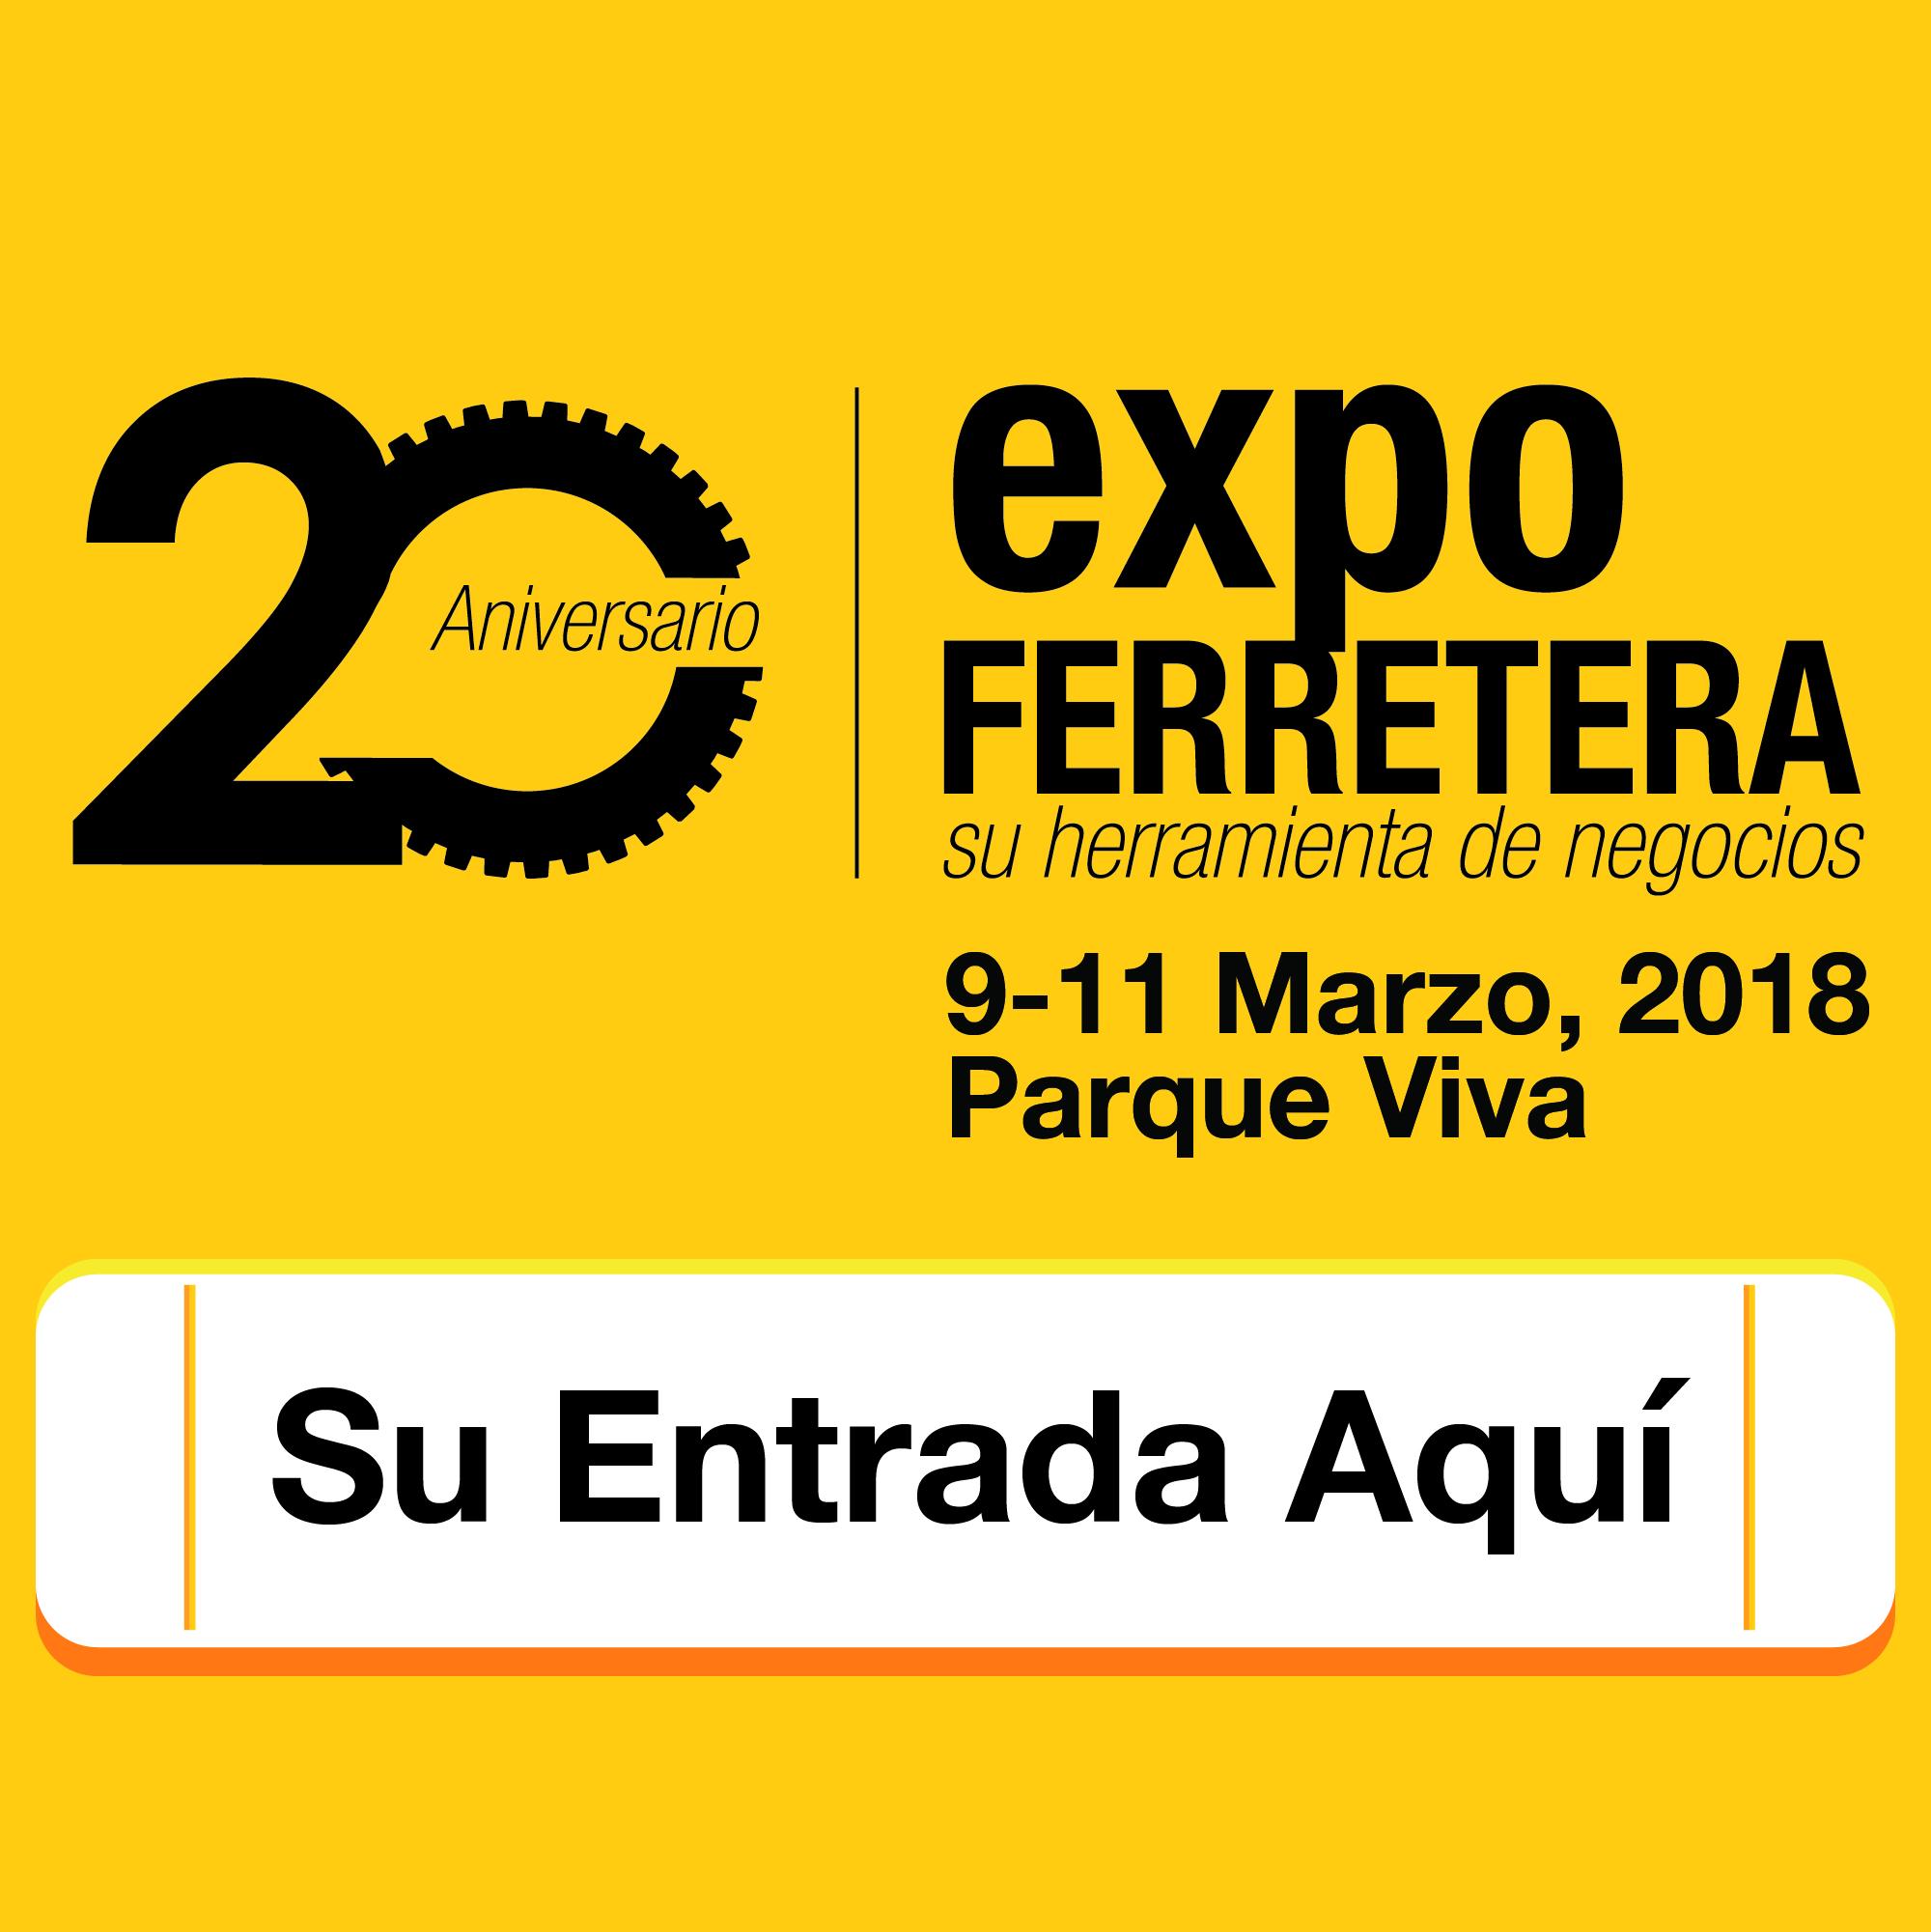 Expoferretera 2018